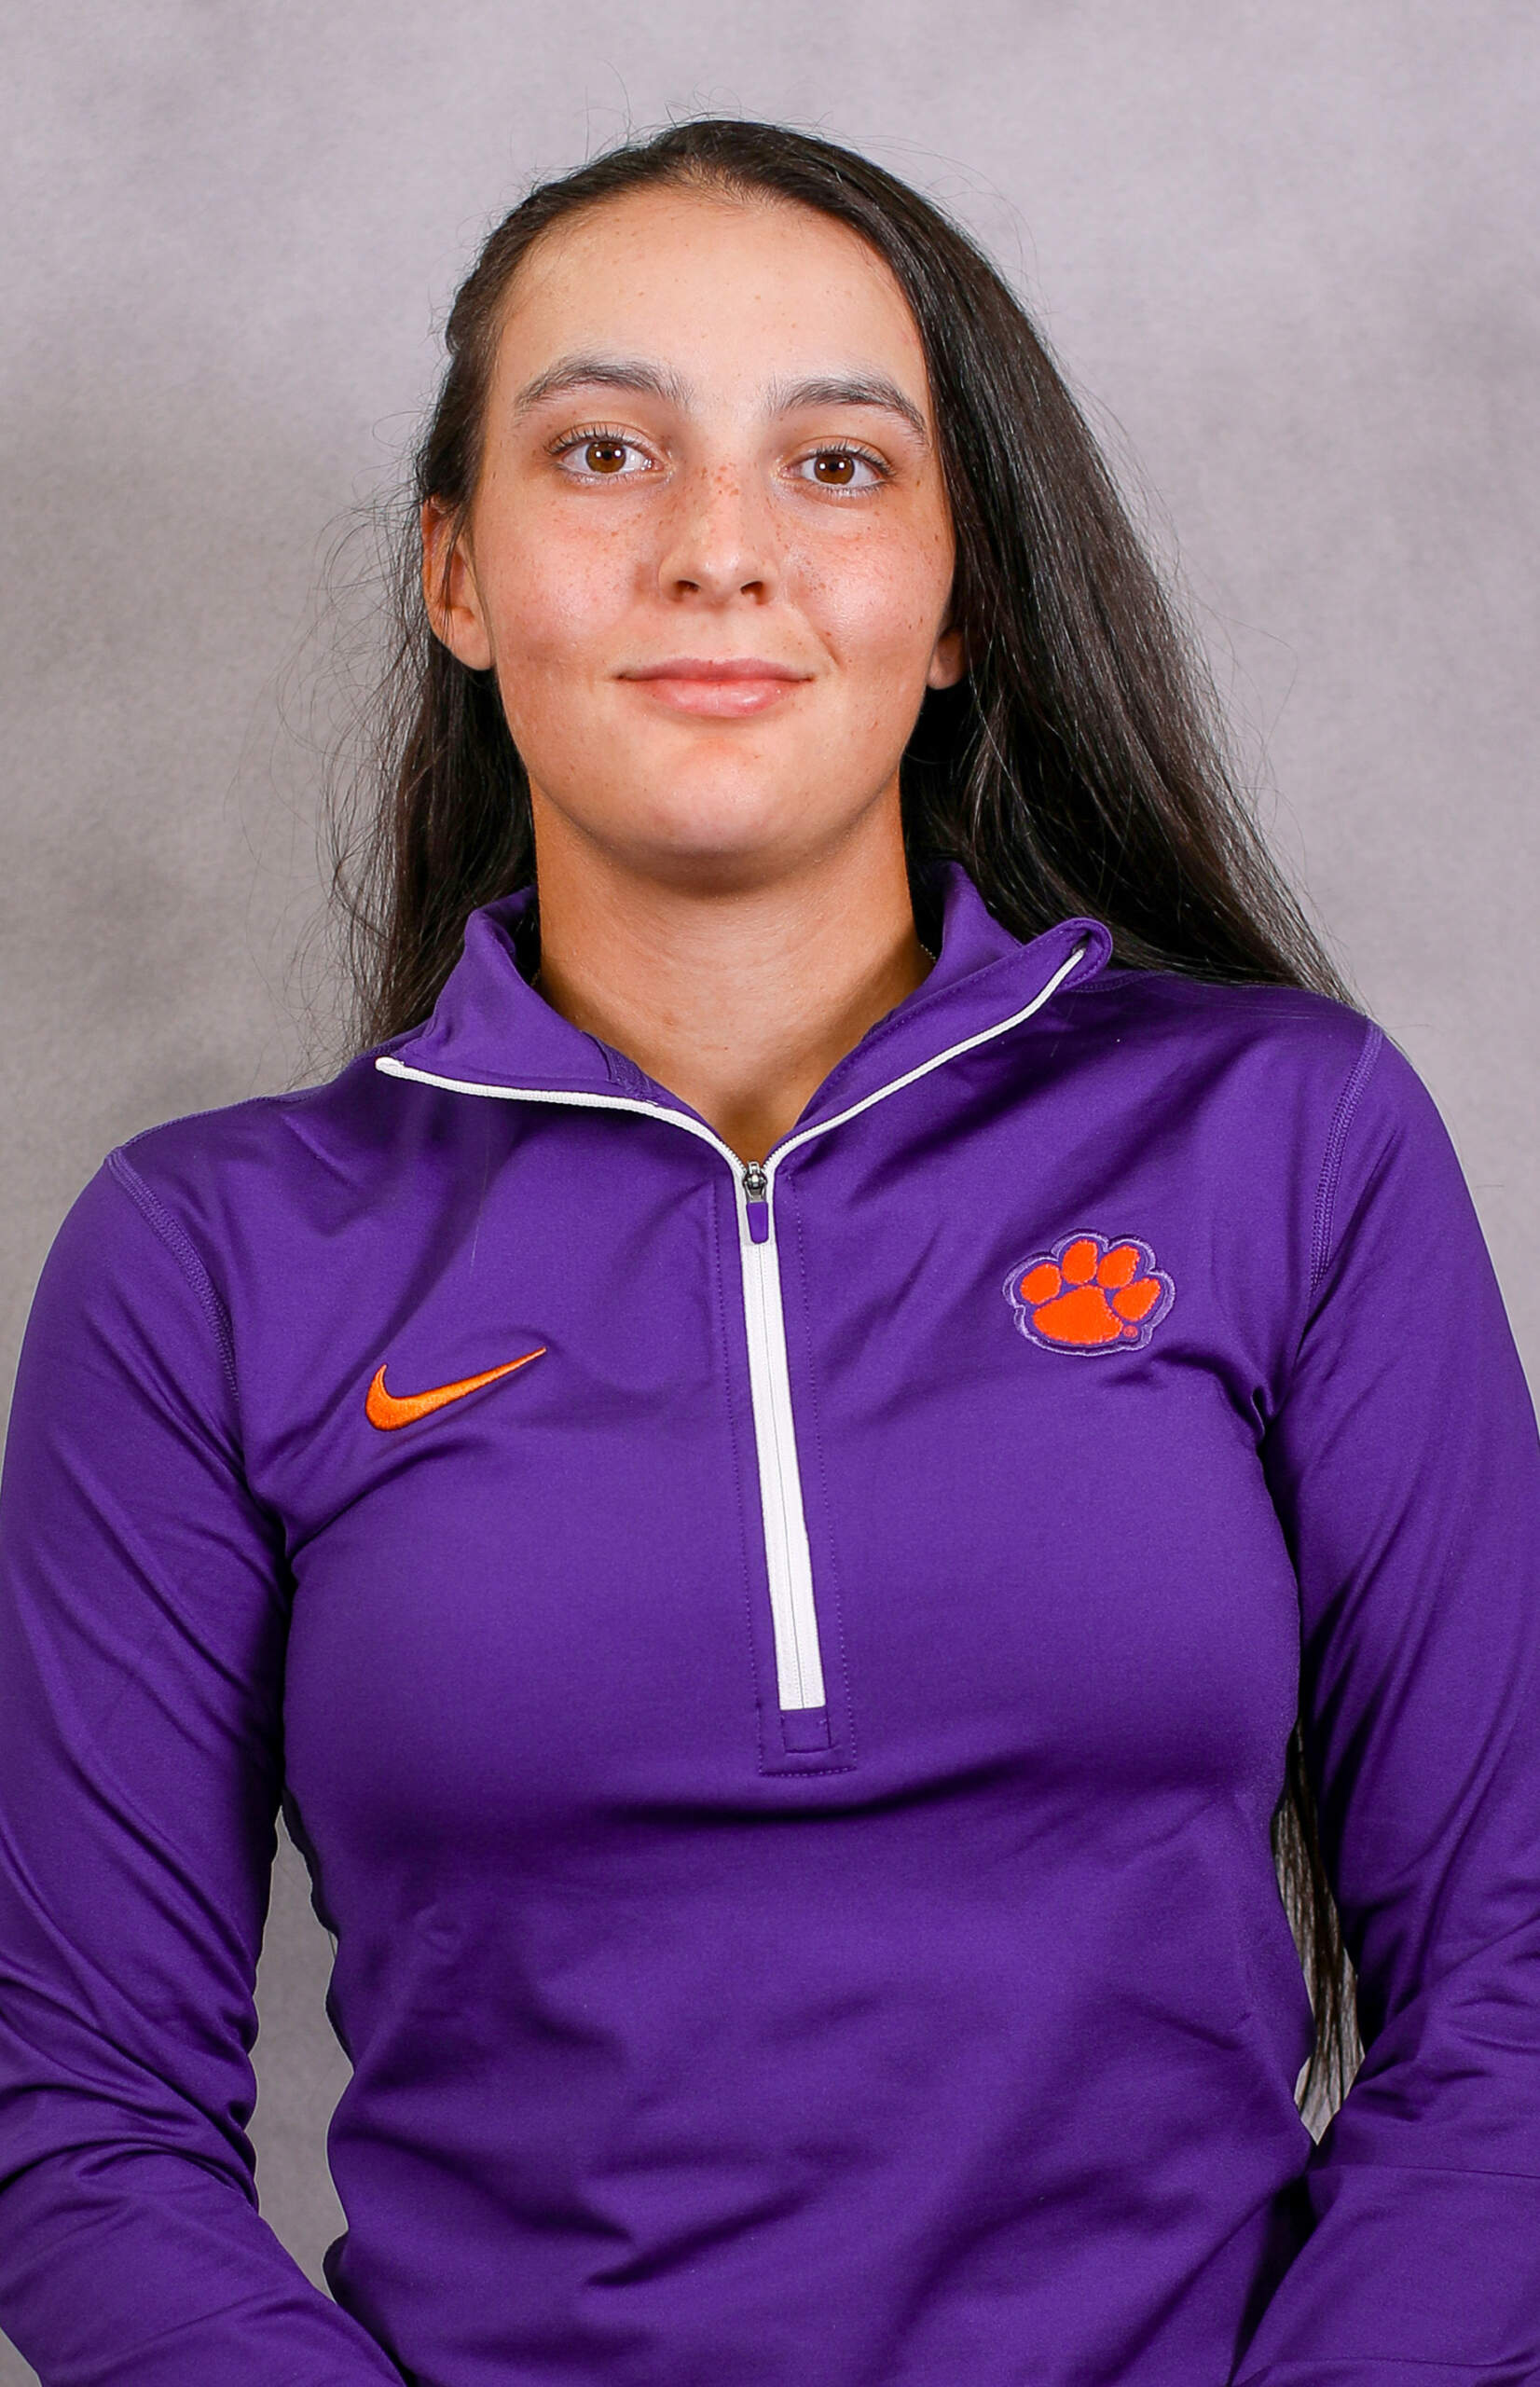 Zaina Nait Omar - Women's Tennis - Clemson University Athletics